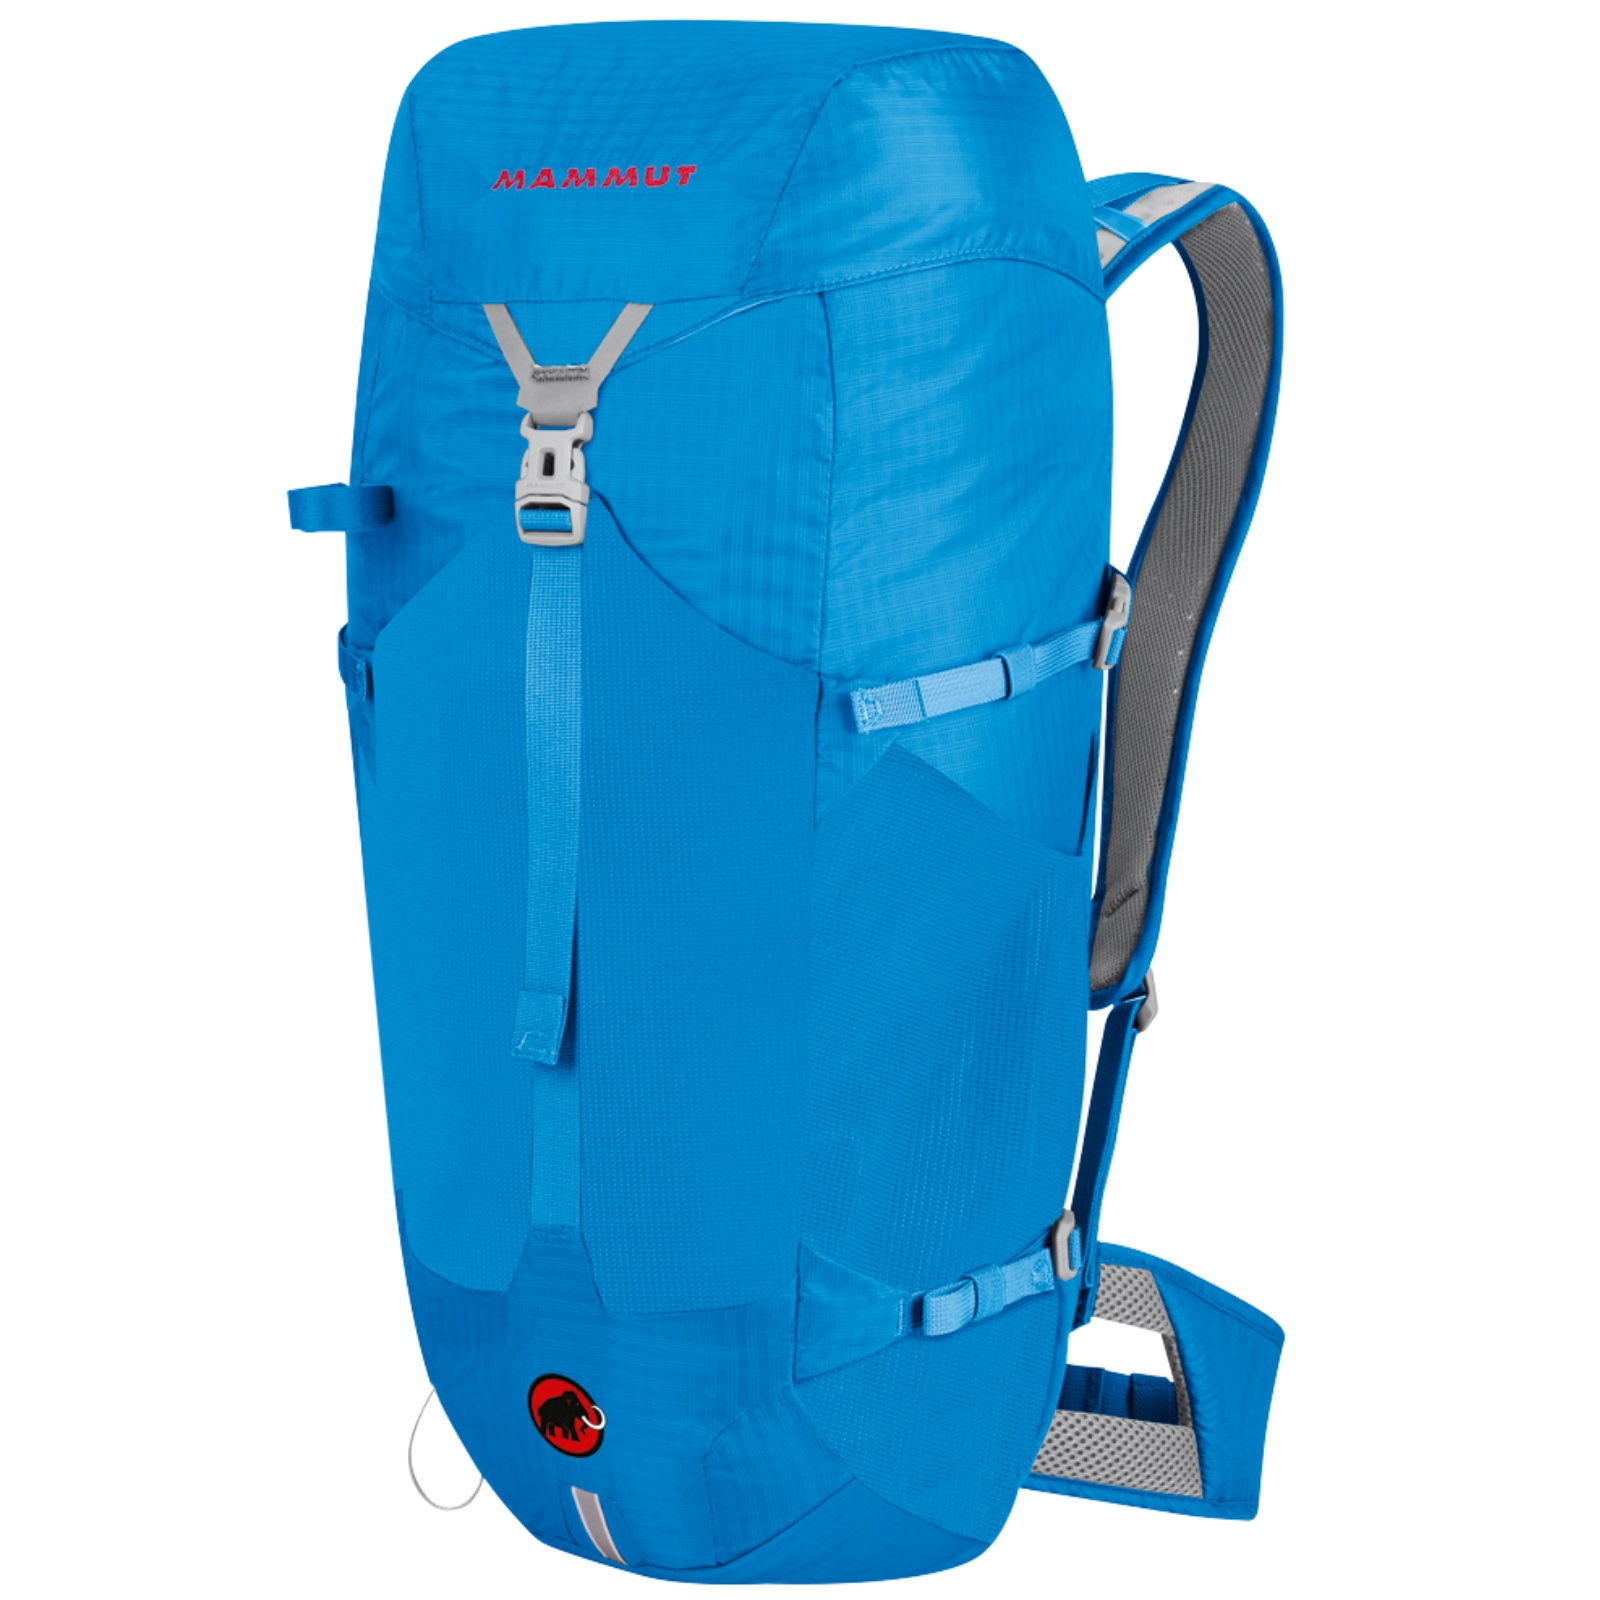 Outdoorový batoh MAMMUT Lithium Light 32 - modrý